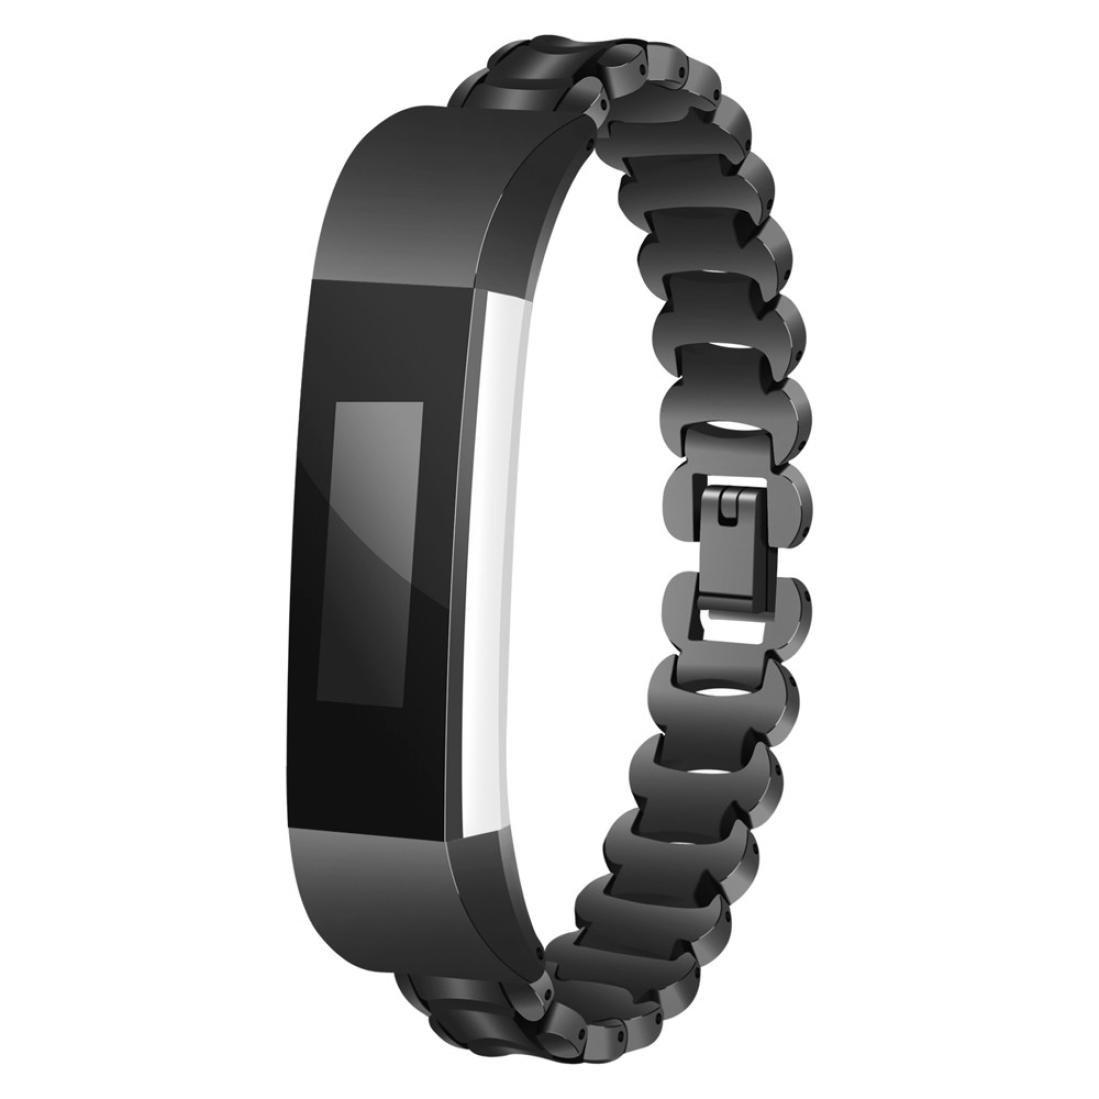 For Fitbit ALTA HR / Fitbit ALTA、Binmer ( TM )純正ステンレススチールWatchブレスレットBand Strap 167mm ブラック Binmer(TM) ブラック ブラック B07847RCXH